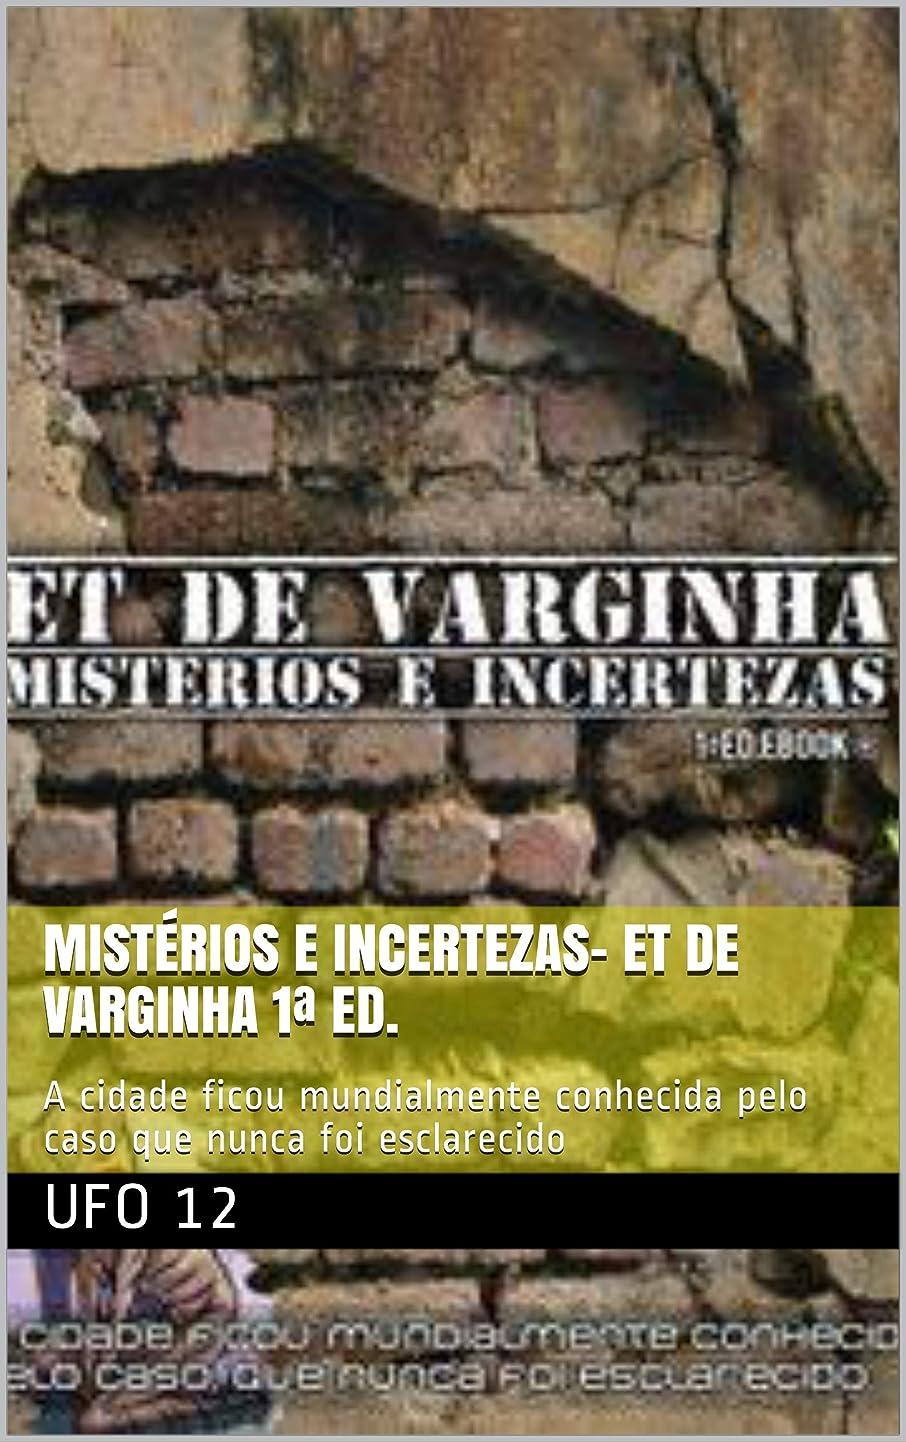 悪行修正喜ぶMistérios e Incertezas- ET de Varginha 1a Ed.: A cidade ficou mundialmente conhecida pelo caso que nunca foi esclarecido (Portuguese Edition)